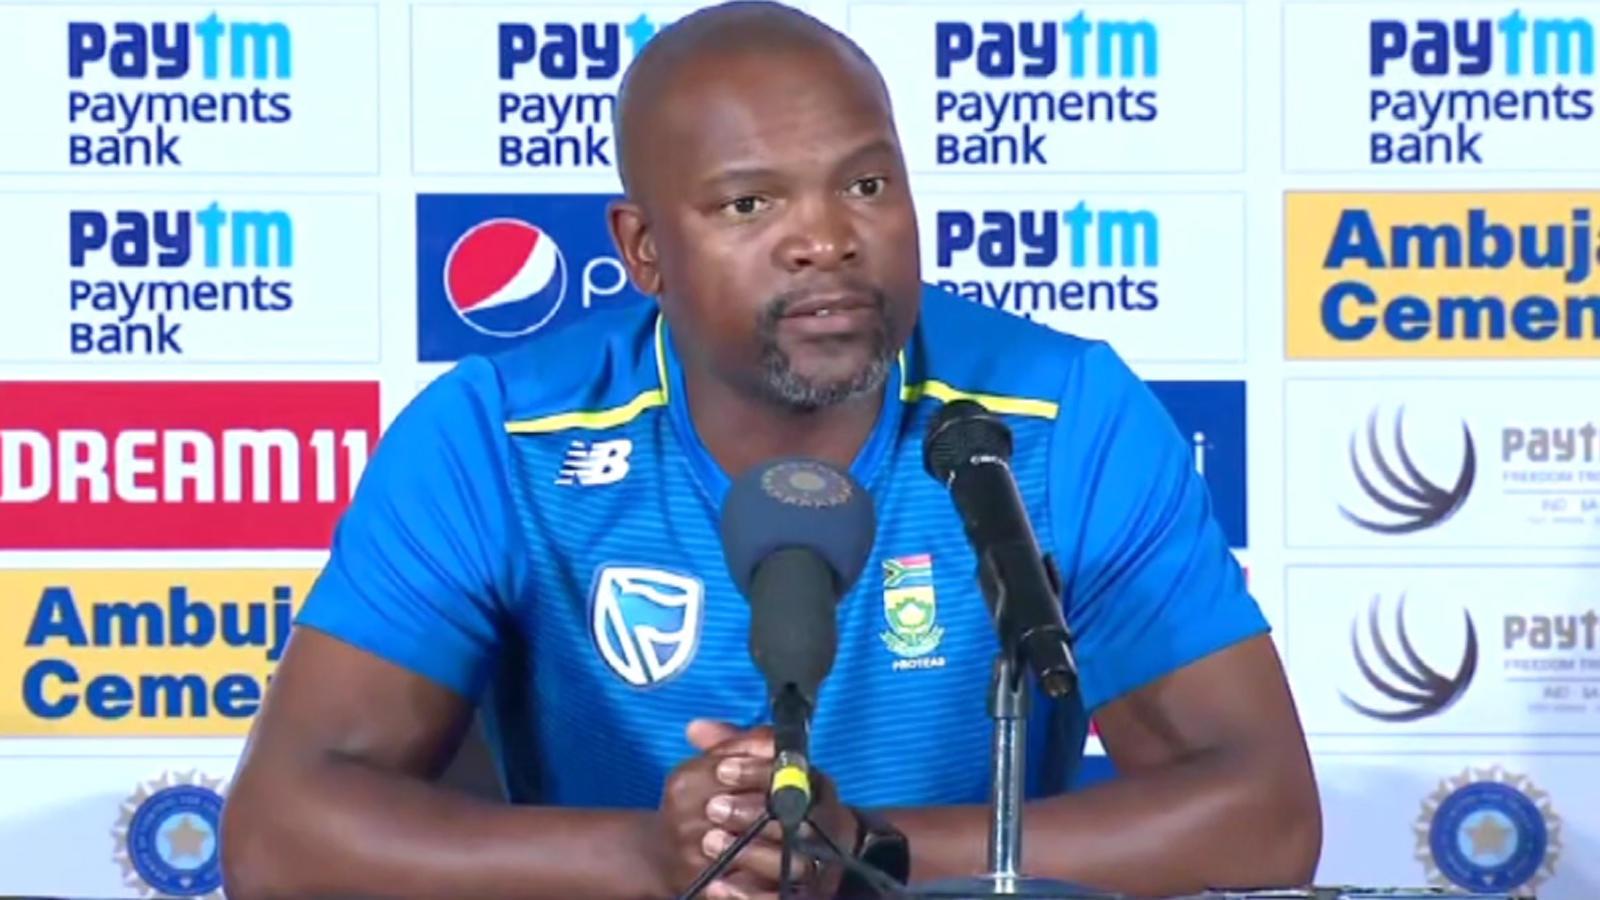 sa-coach-enoch-nkwe-calls-virat-kohli-a-world-class-player